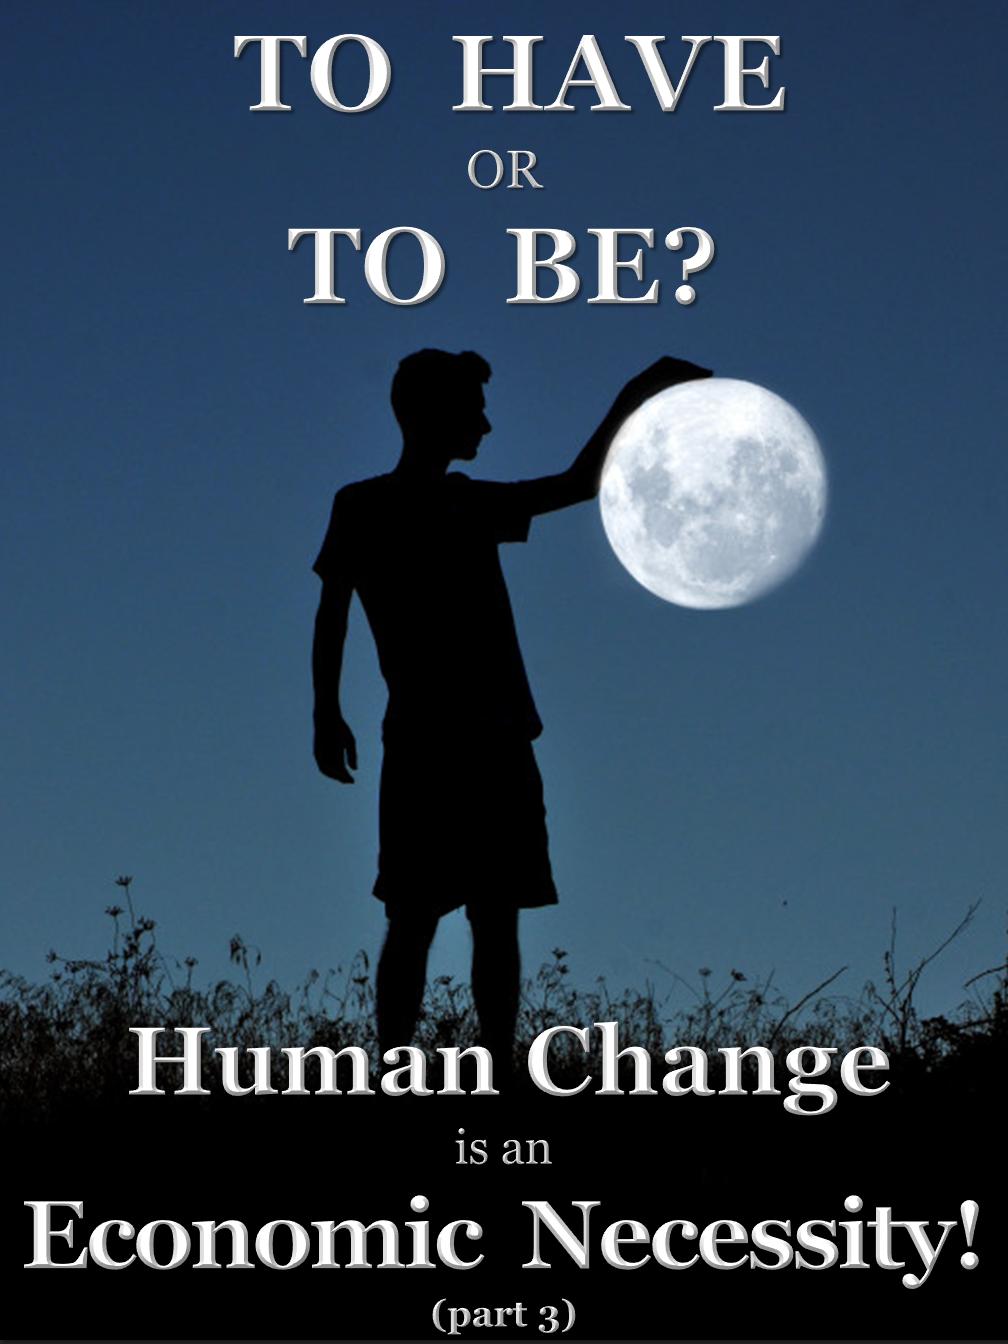 Human Change is a Economic Necessity